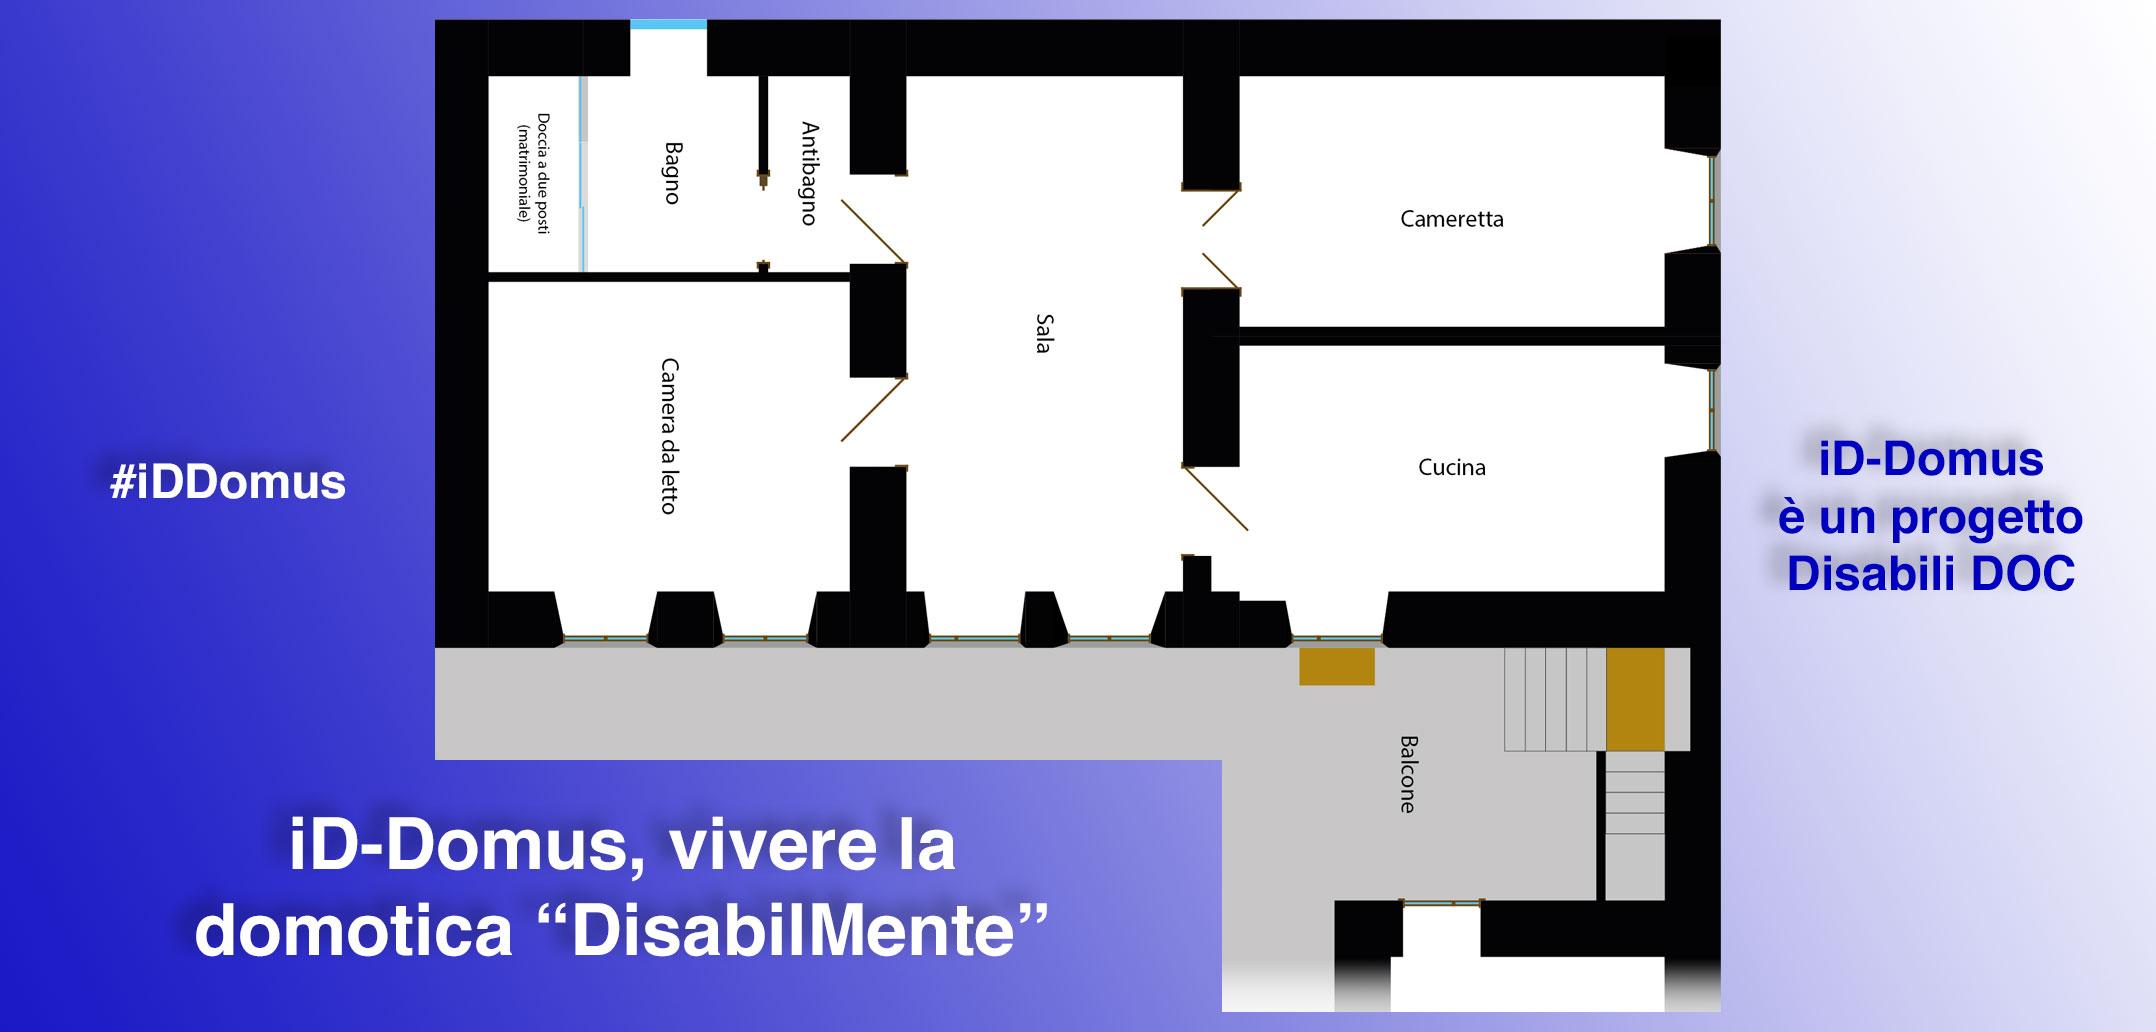 "#iDDomus / Parte 1ª / Premessa: vivere la domotica ""DisabilMente"""